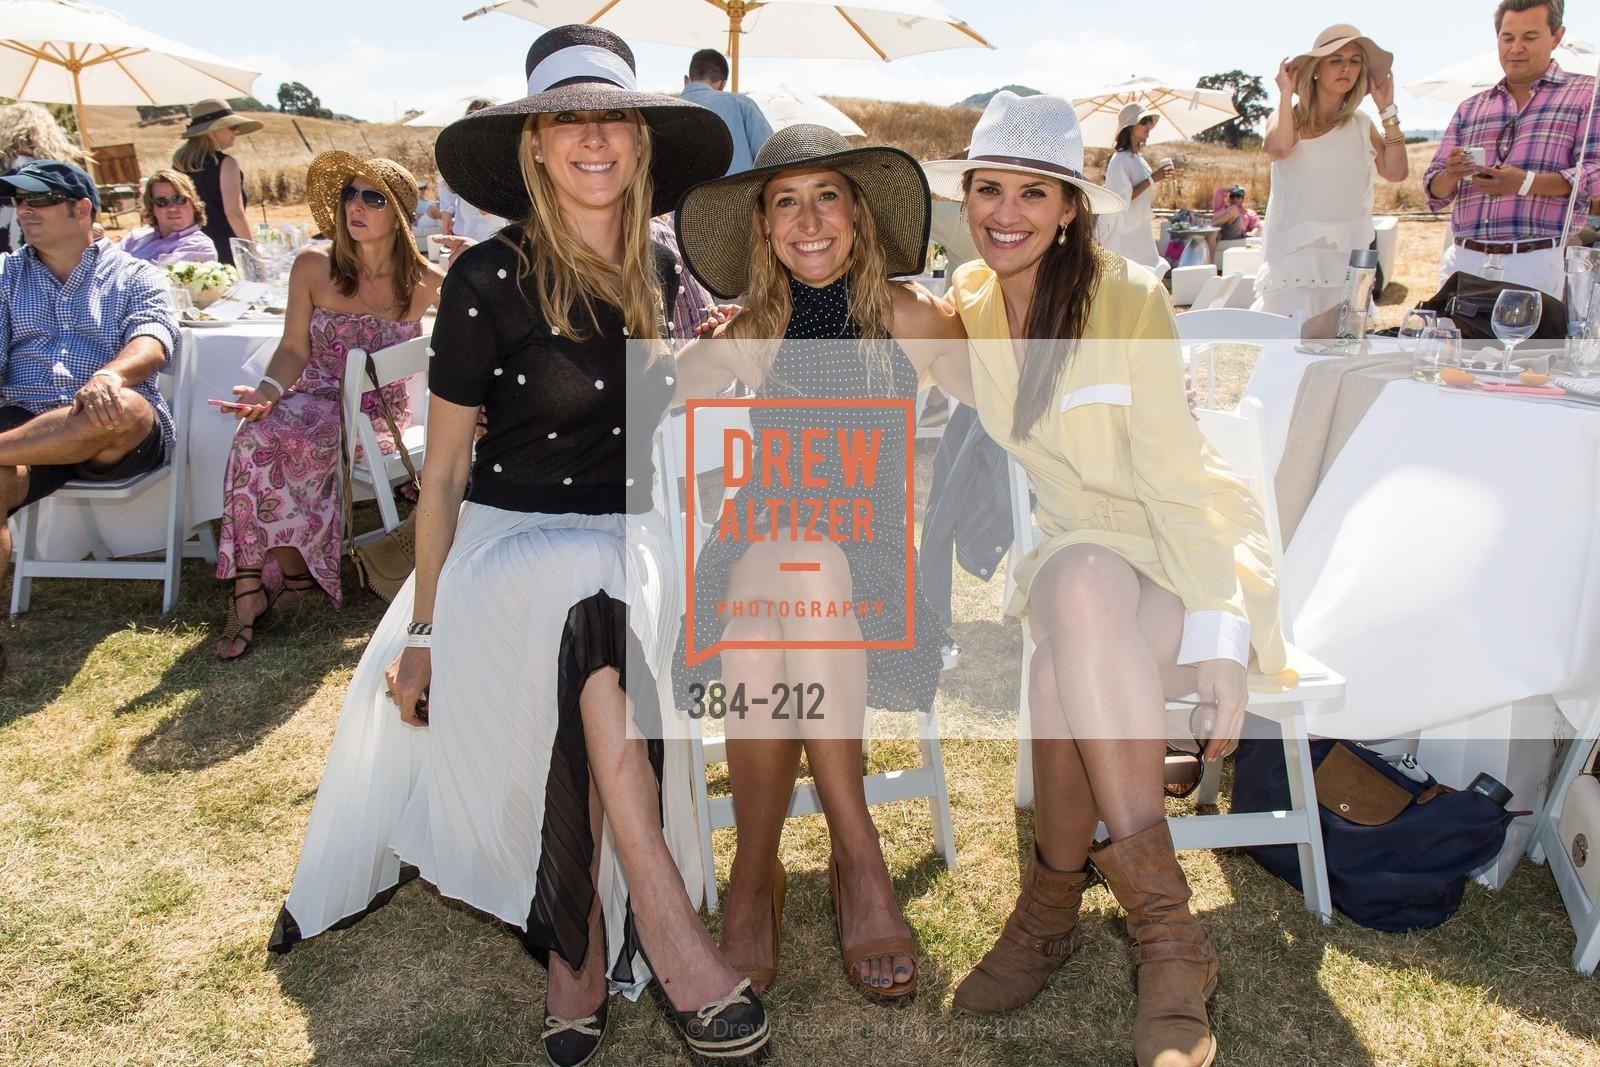 Lauren Wolfe, Jess Perez, Meredith Kendall, Photo #384-212